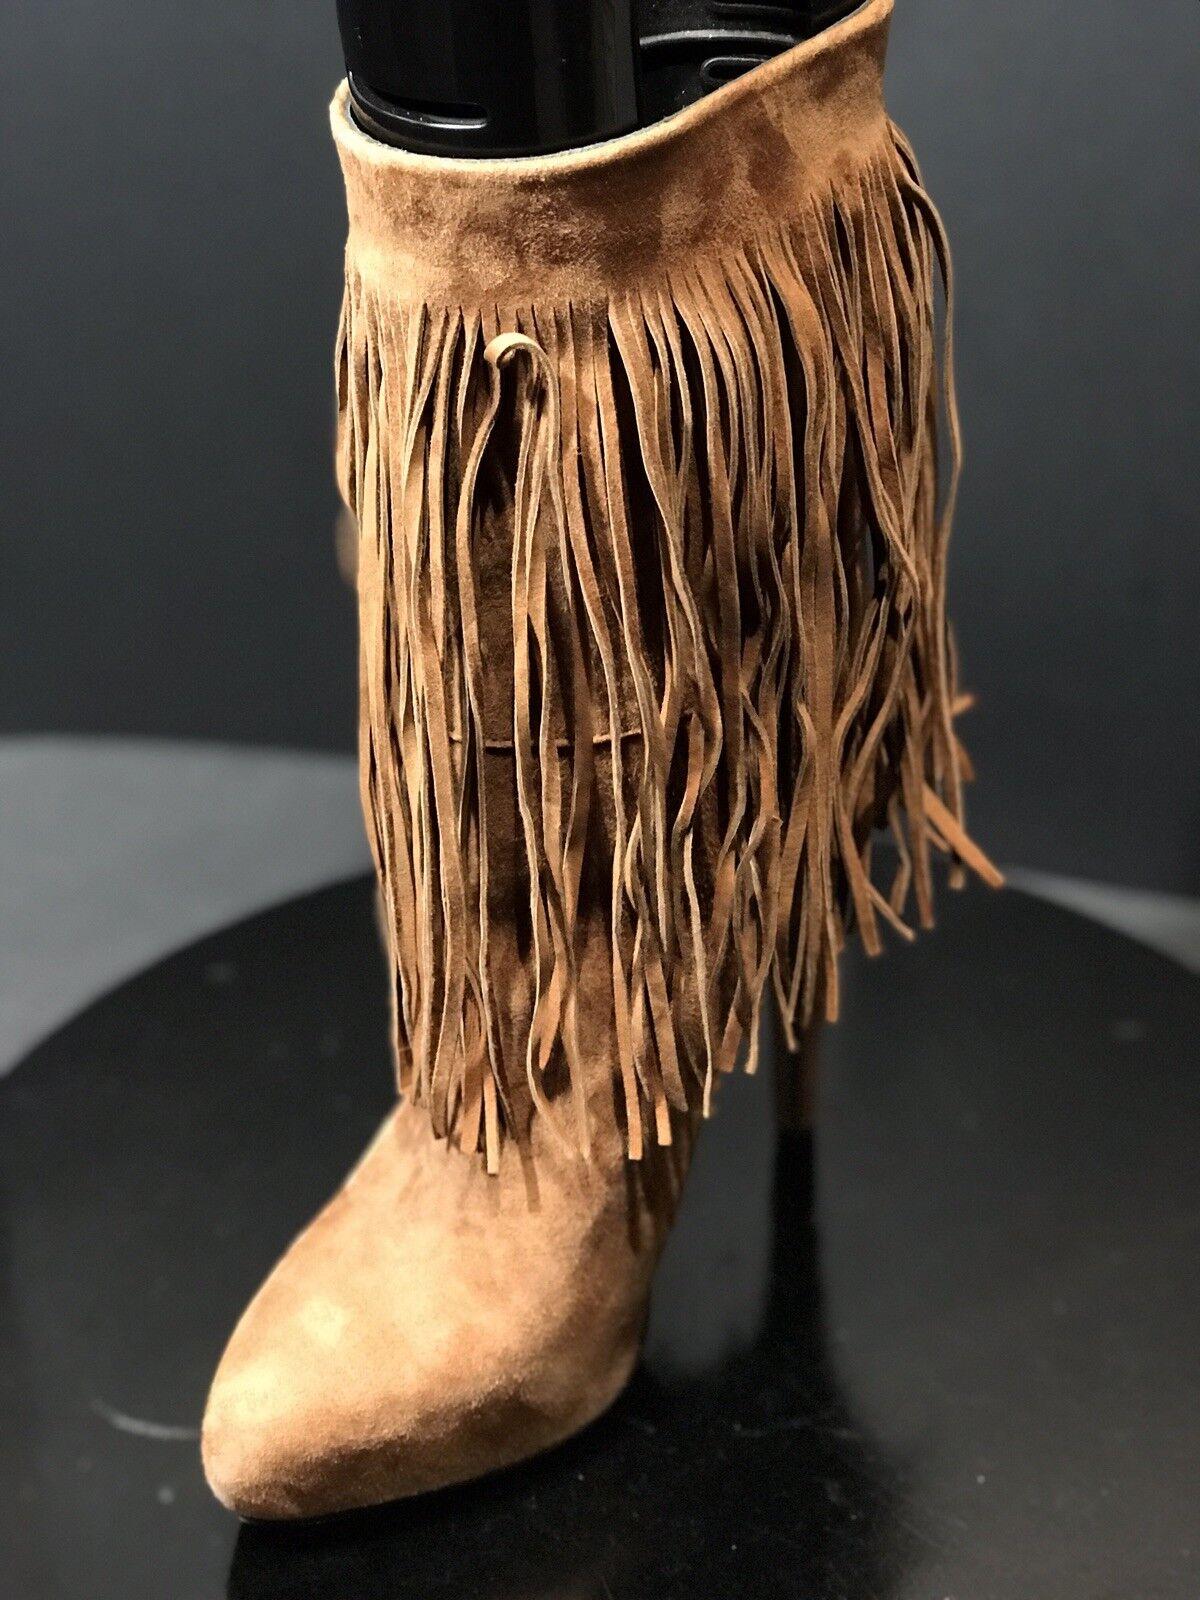 Massimo Matteo Matteo Matteo para Mujer Moda botas De Gamuza Marrón Flecos Cacau Talla 7 M  forma única